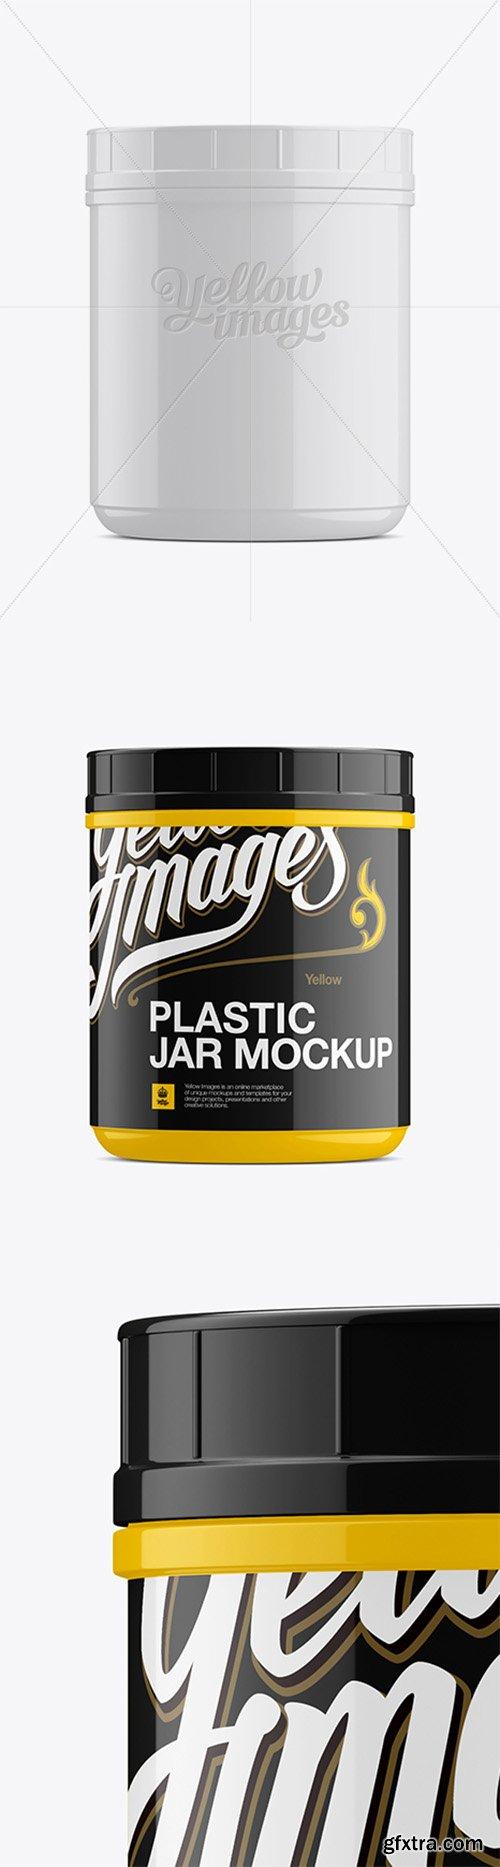 Glossy Plastic Jar Mockup - Front View 14146